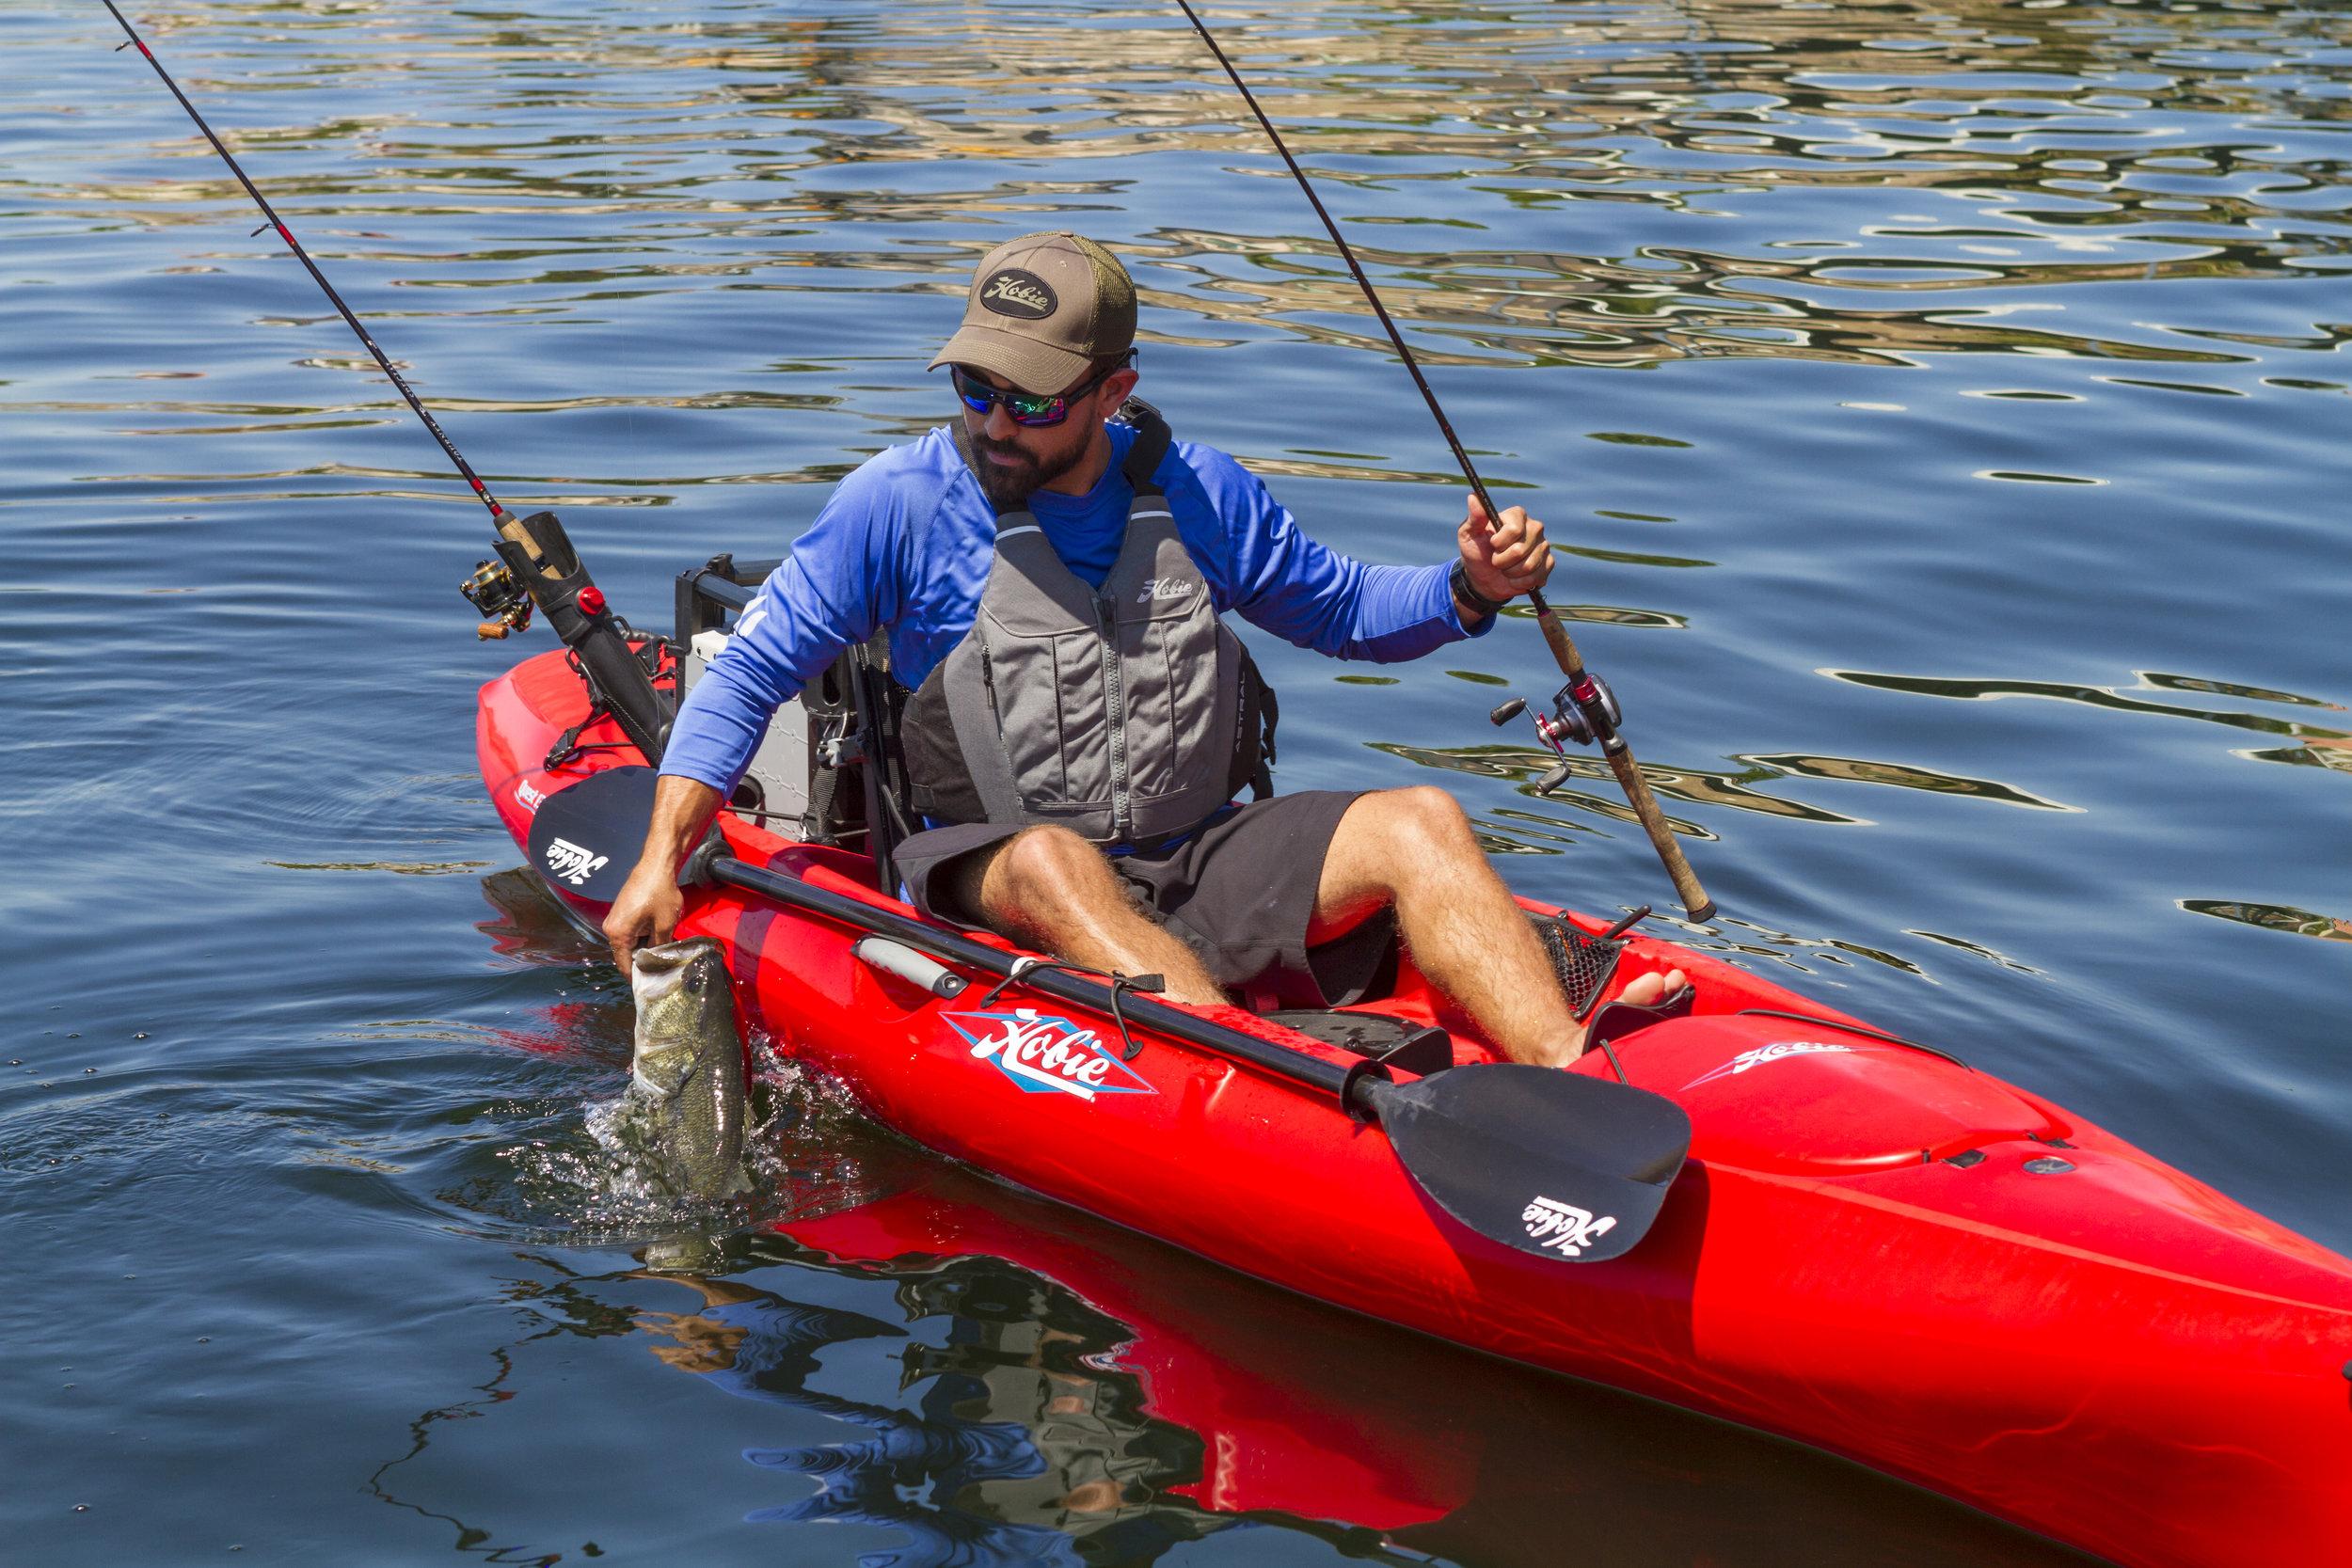 Quest13_fishing_Howie_CanyonLake_Bass_0149_full.jpg